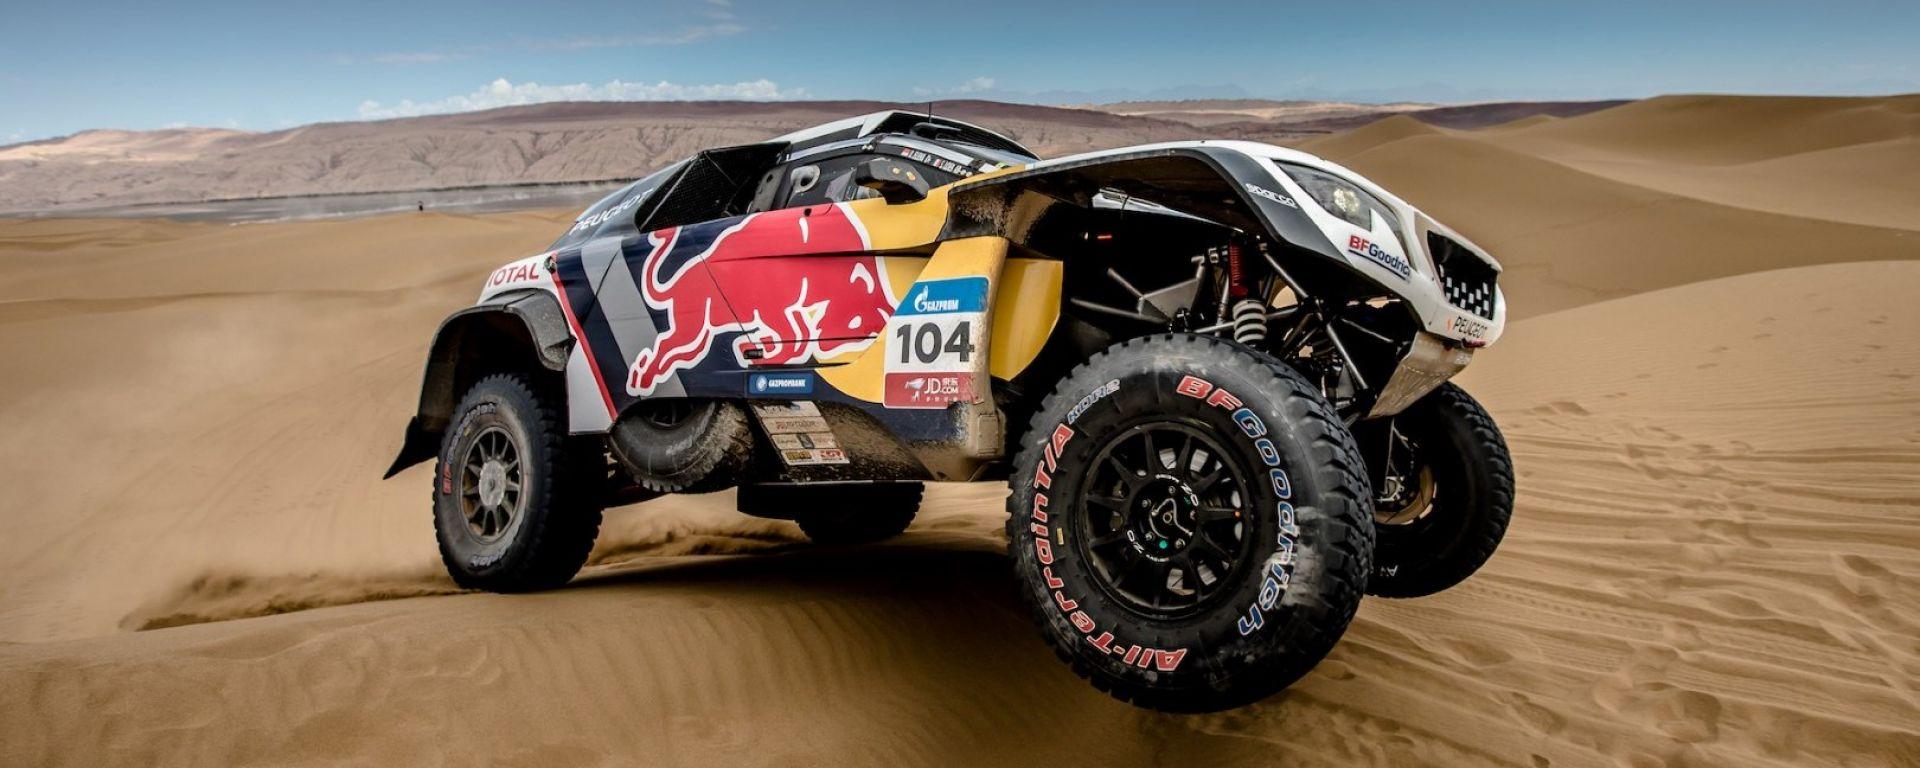 Peugeot DKR Maxi 2017